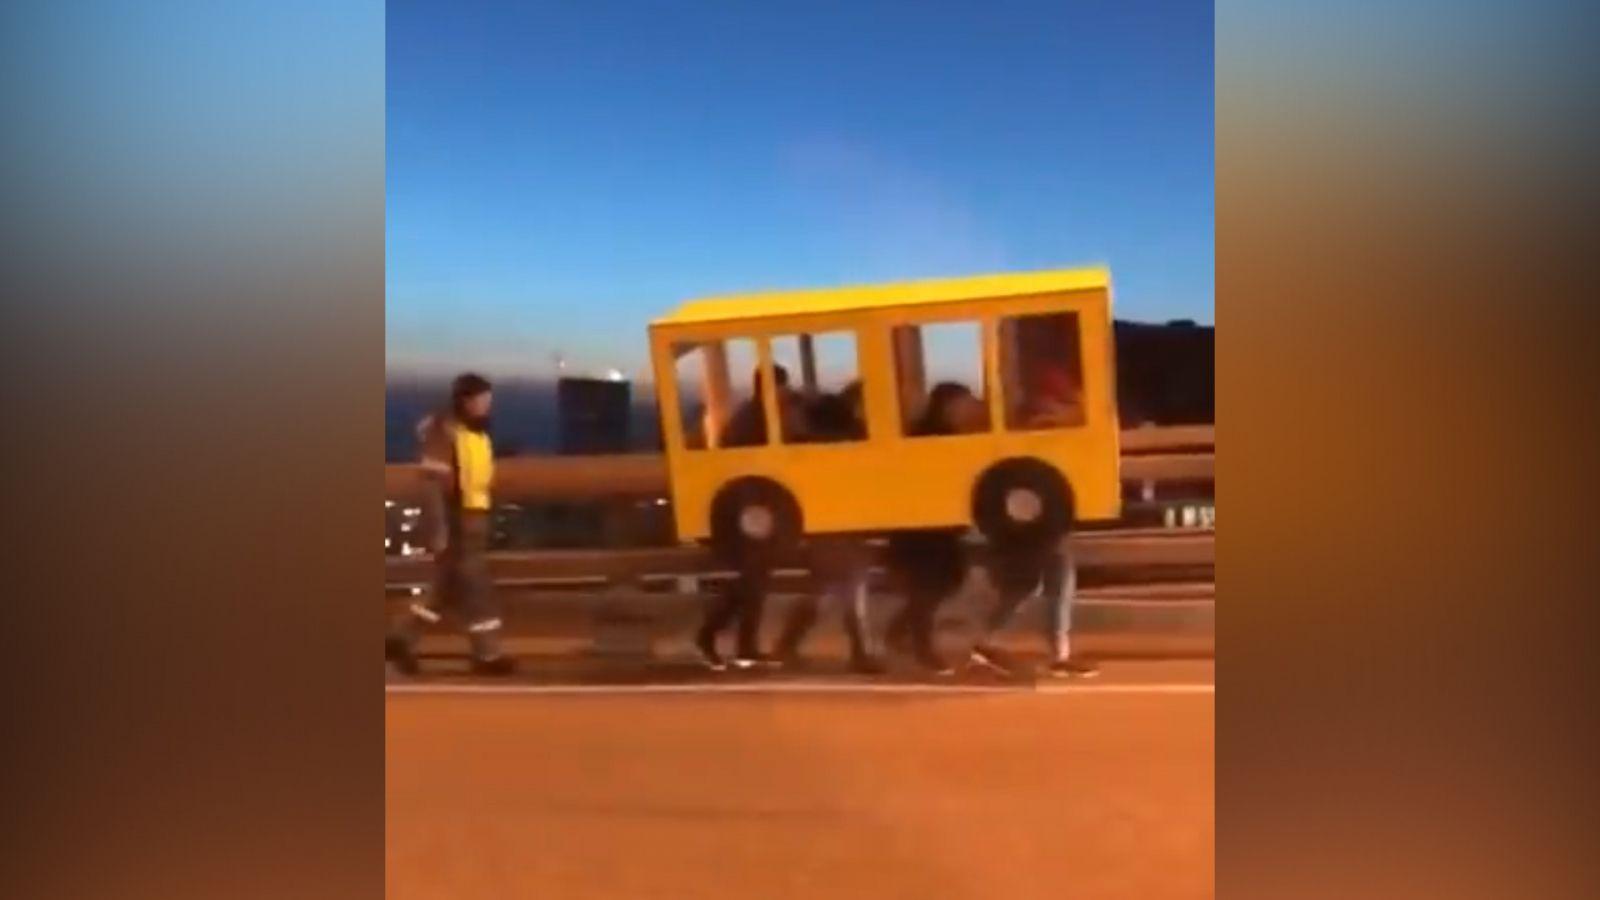 russians-caught-trying-cross-bridge-cardboard-bus